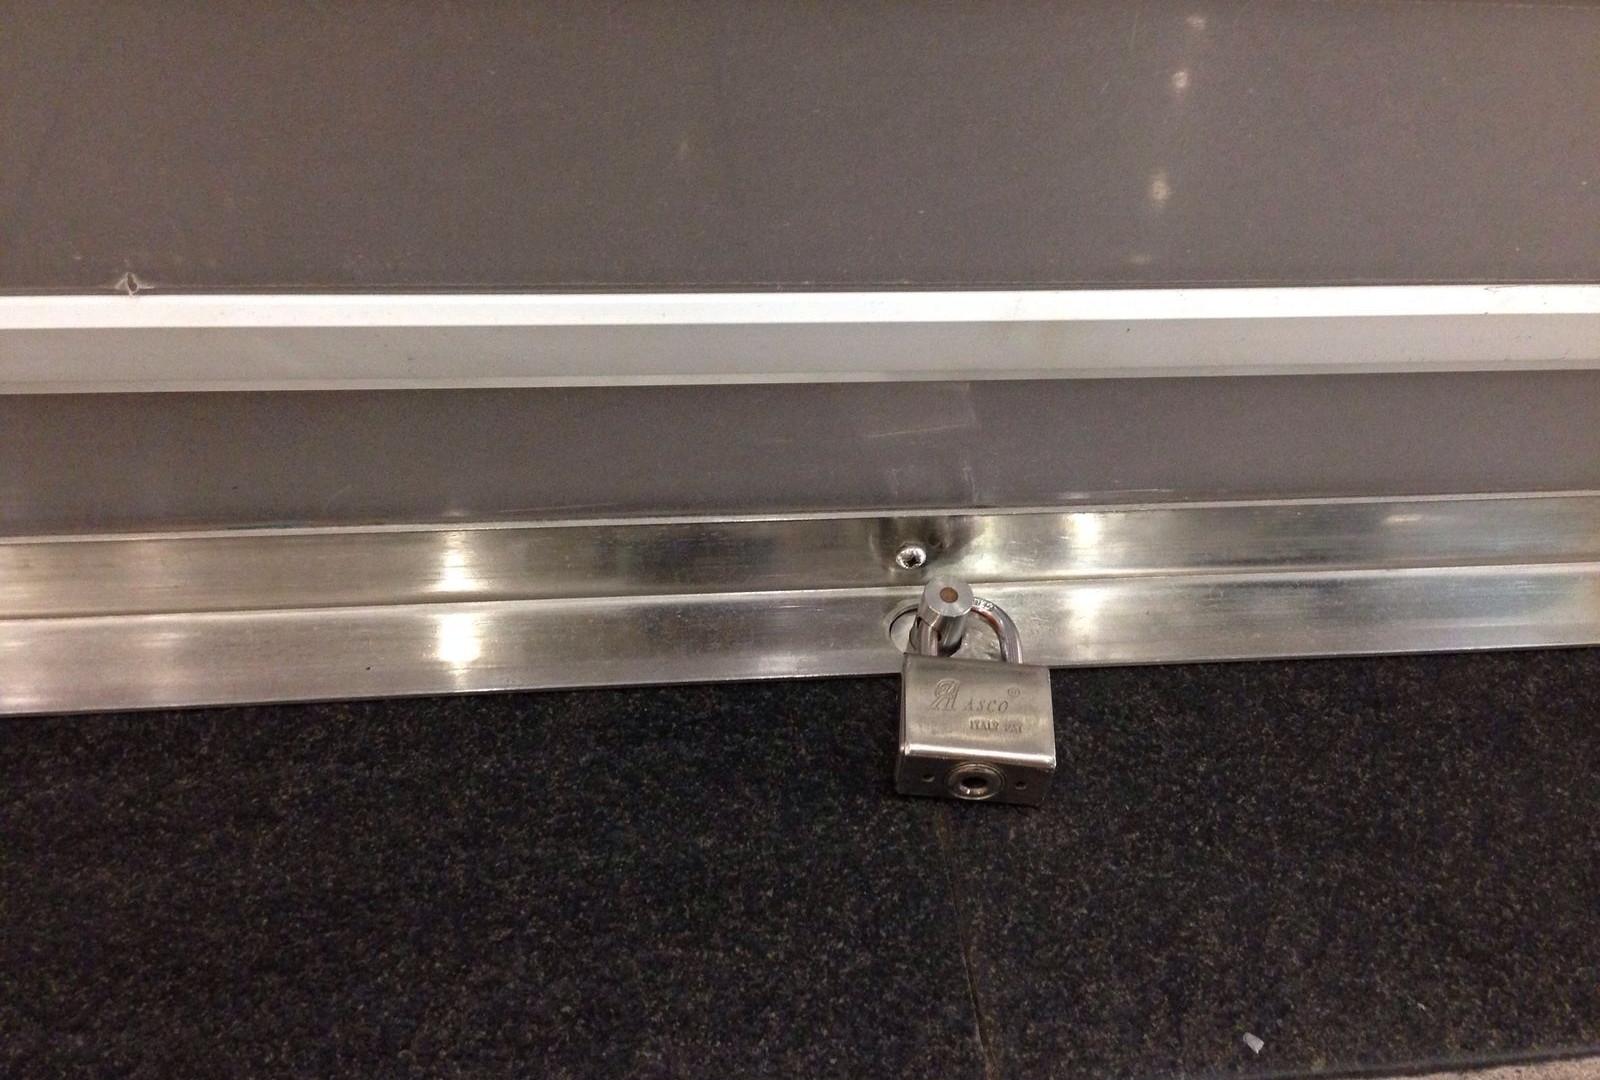 G-Lock Padlock System For Maximum Roller Shutter Security